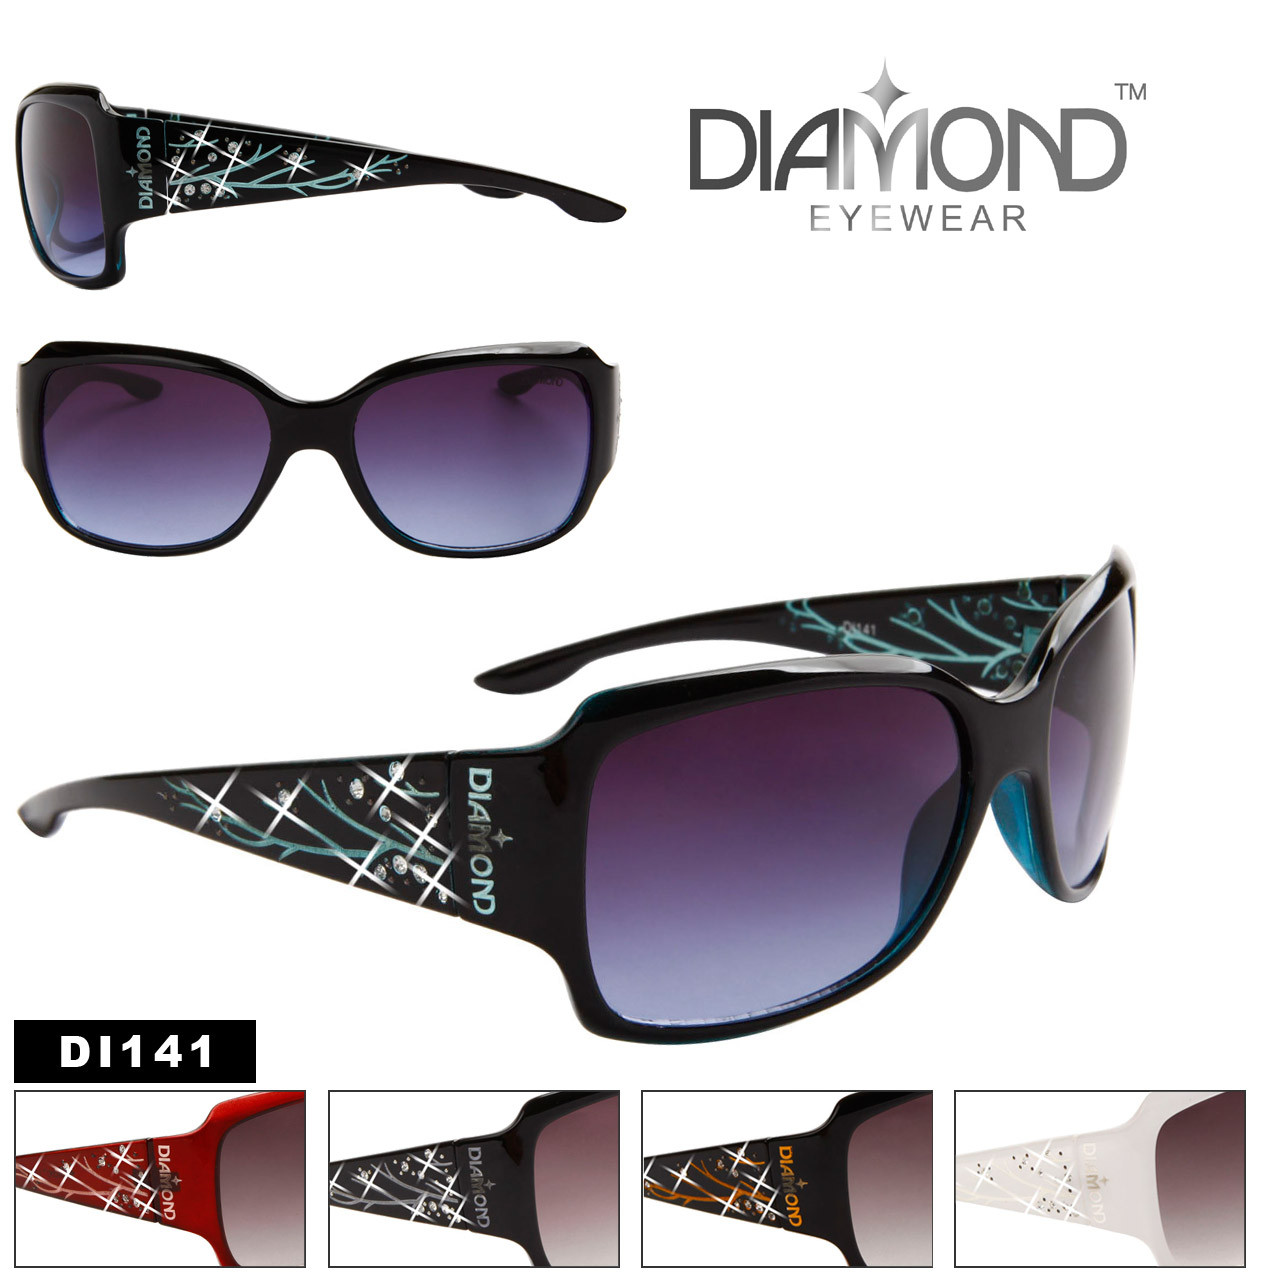 Women's Rhinestone Sunglasses - Diamond™ Eyewear - Style # DI141 (Assorted Colors) (12 pcs.)